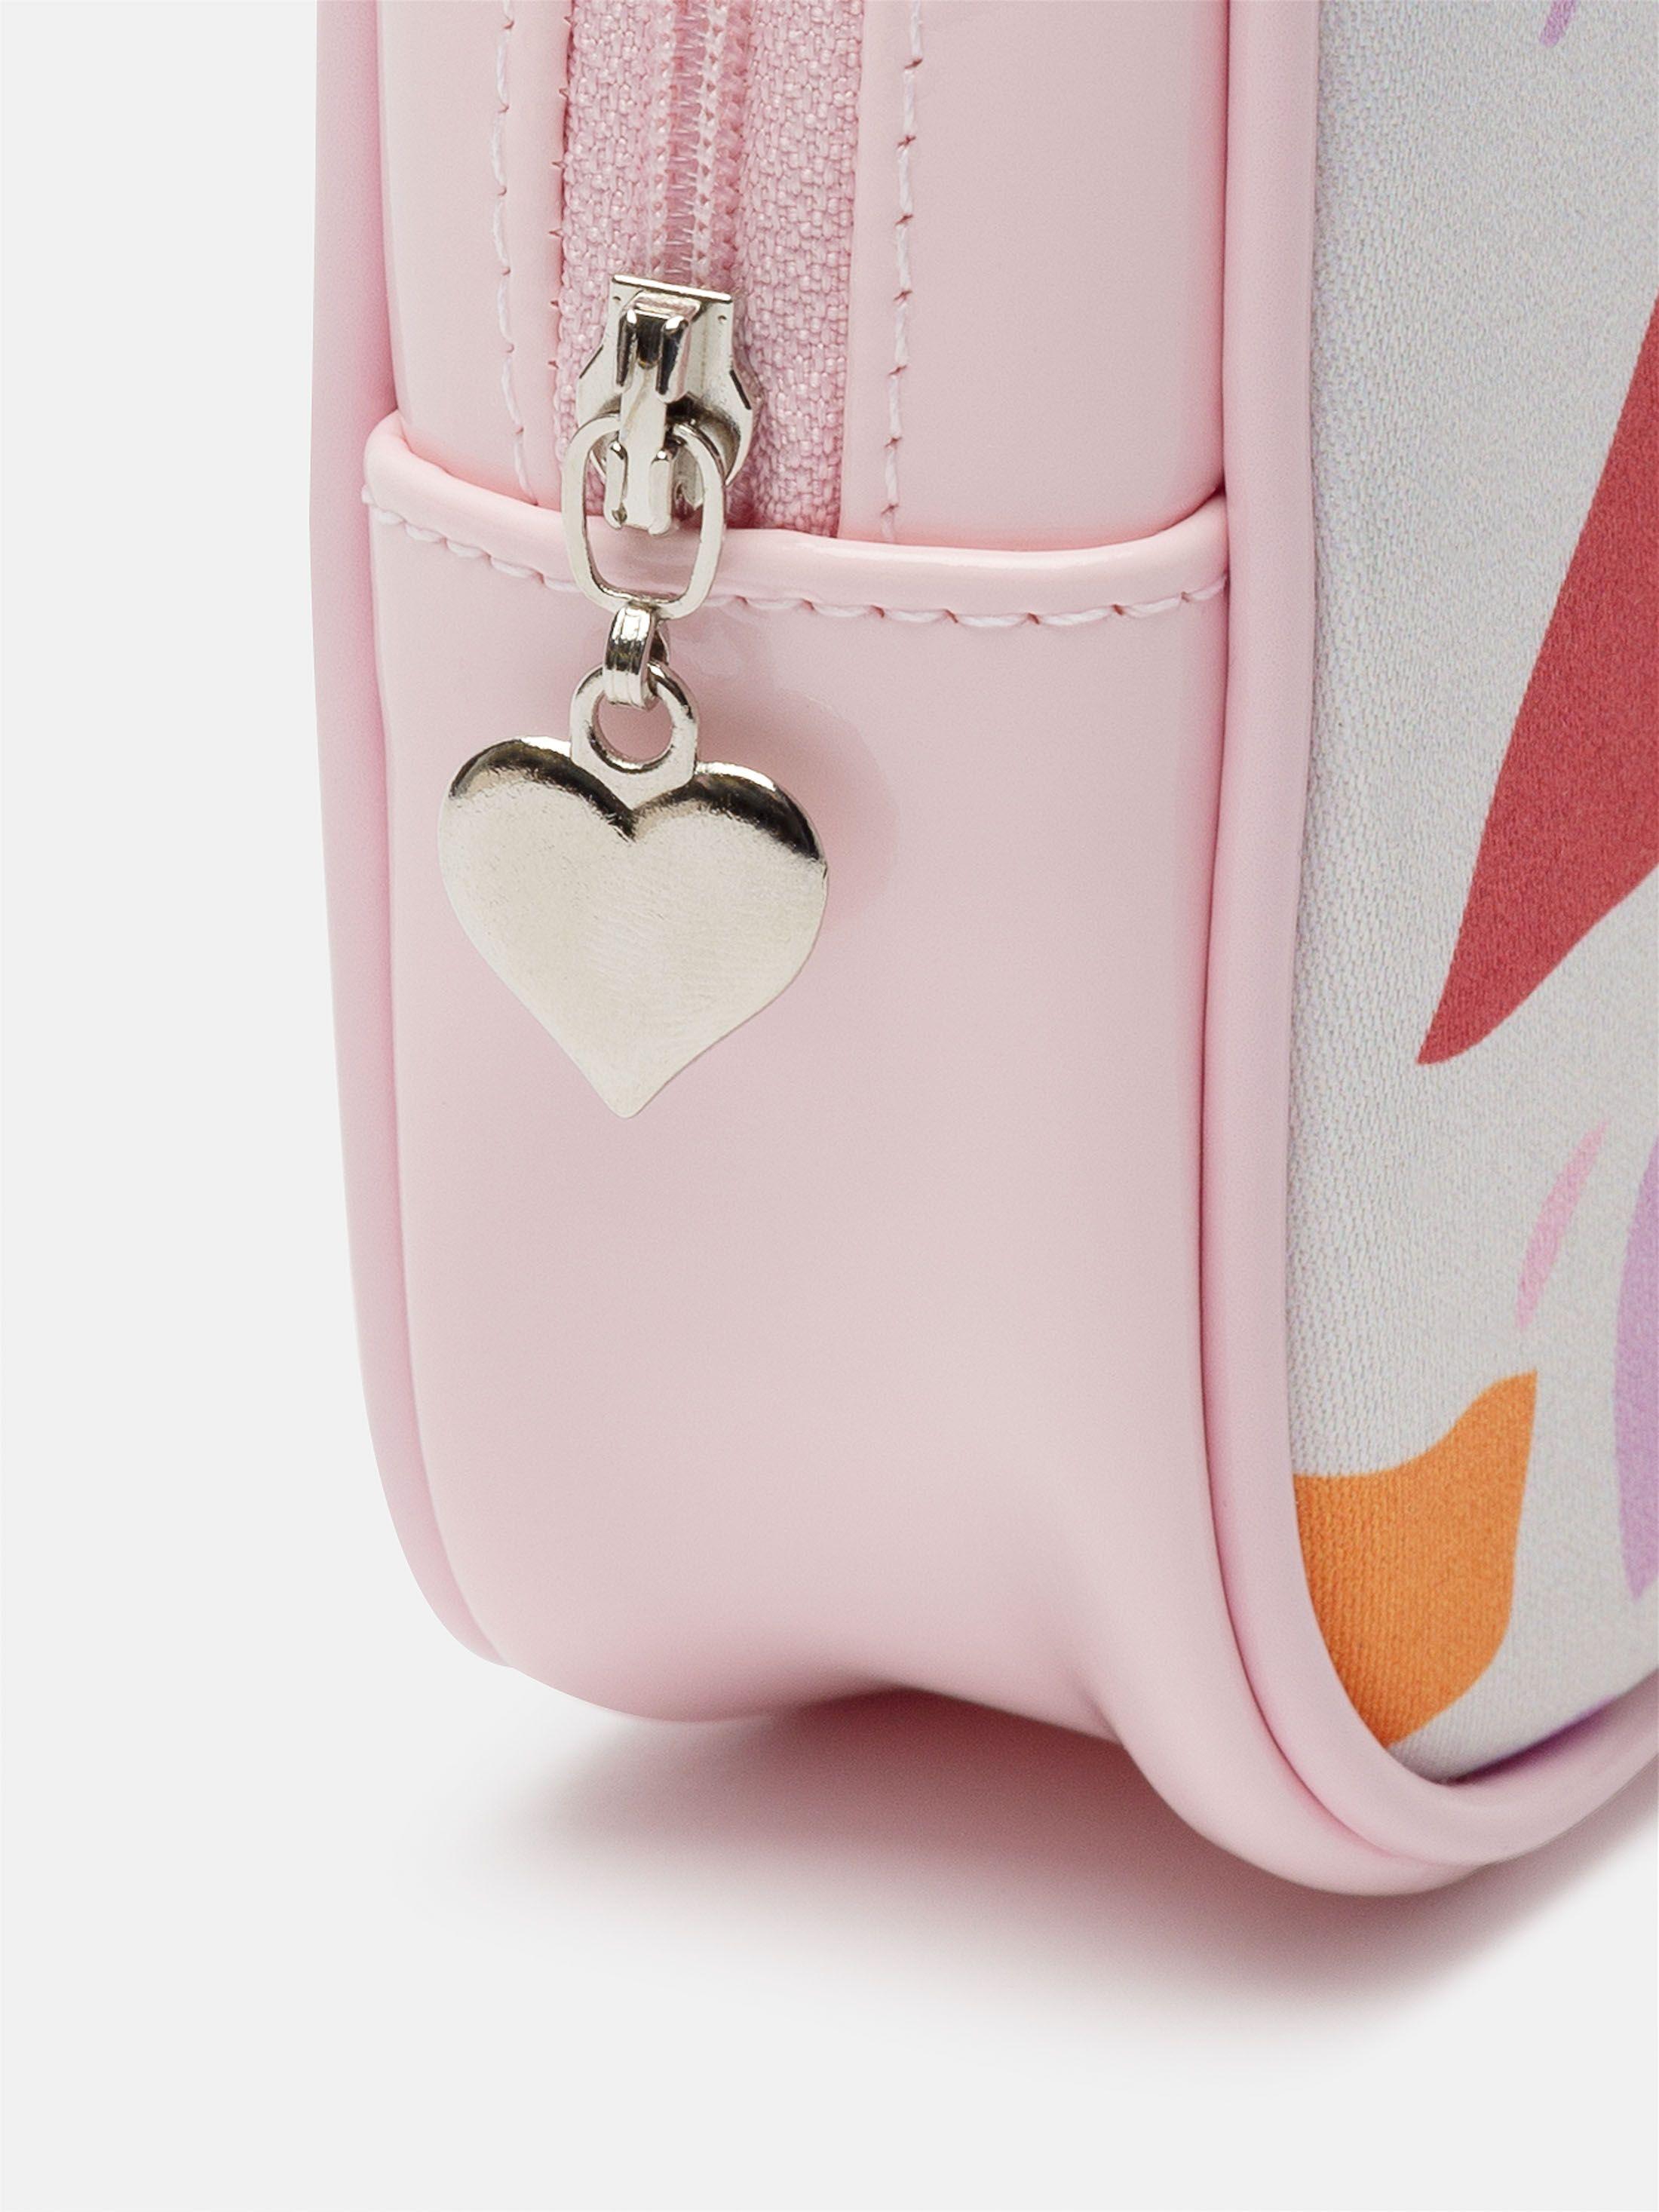 design your own makeup bags